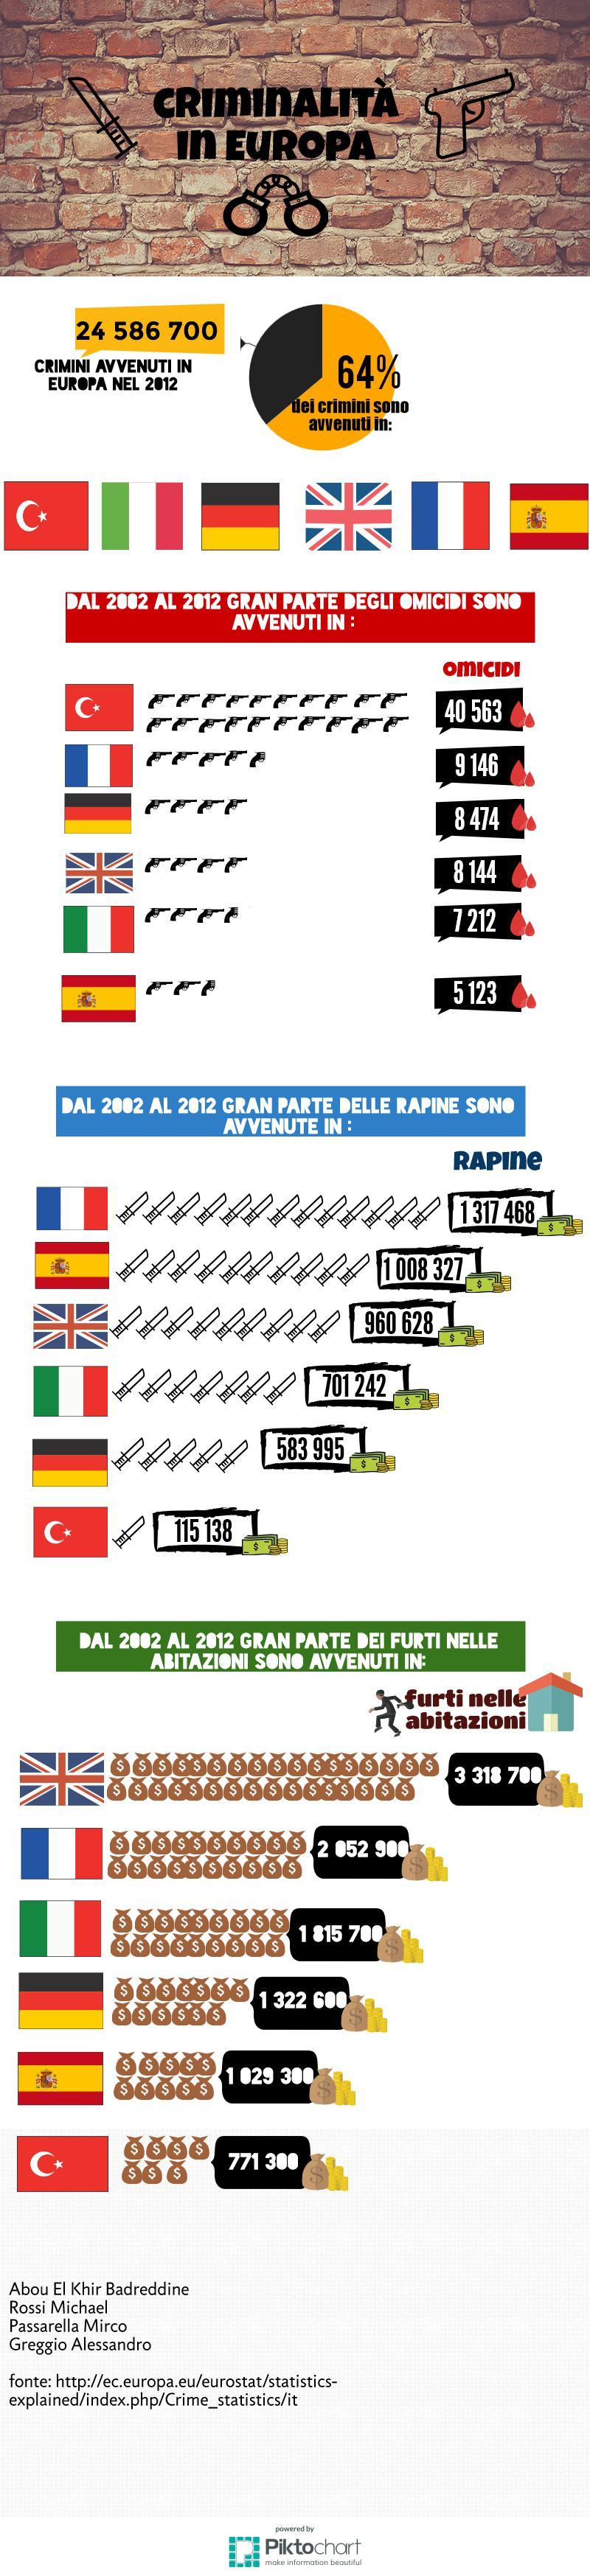 criminalita-in-europa